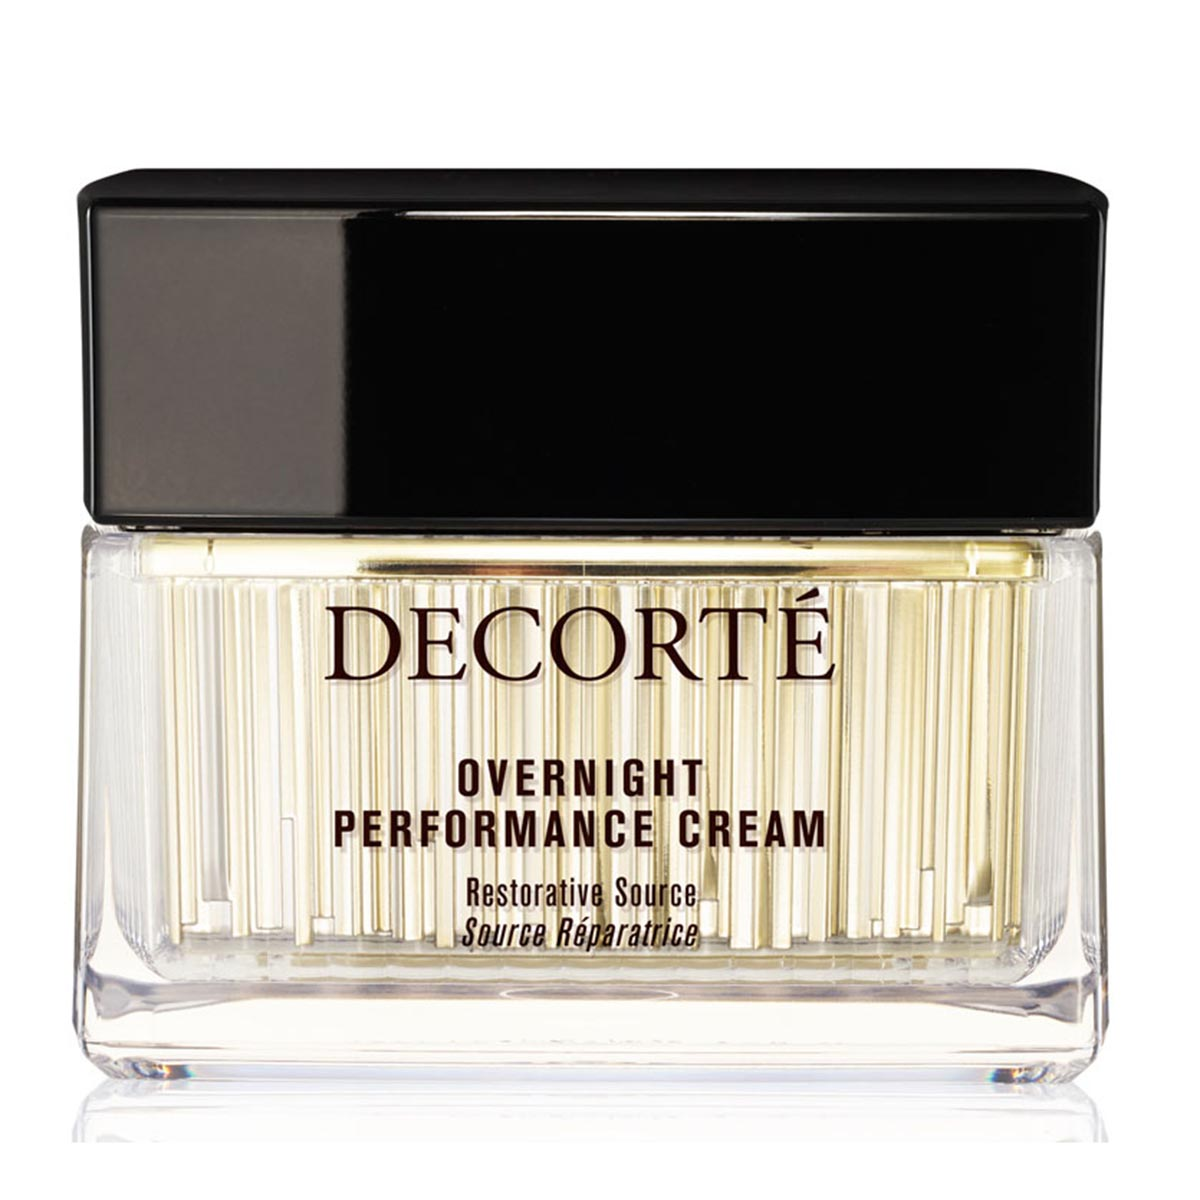 Cosme decorte overnight performance cream 50ml